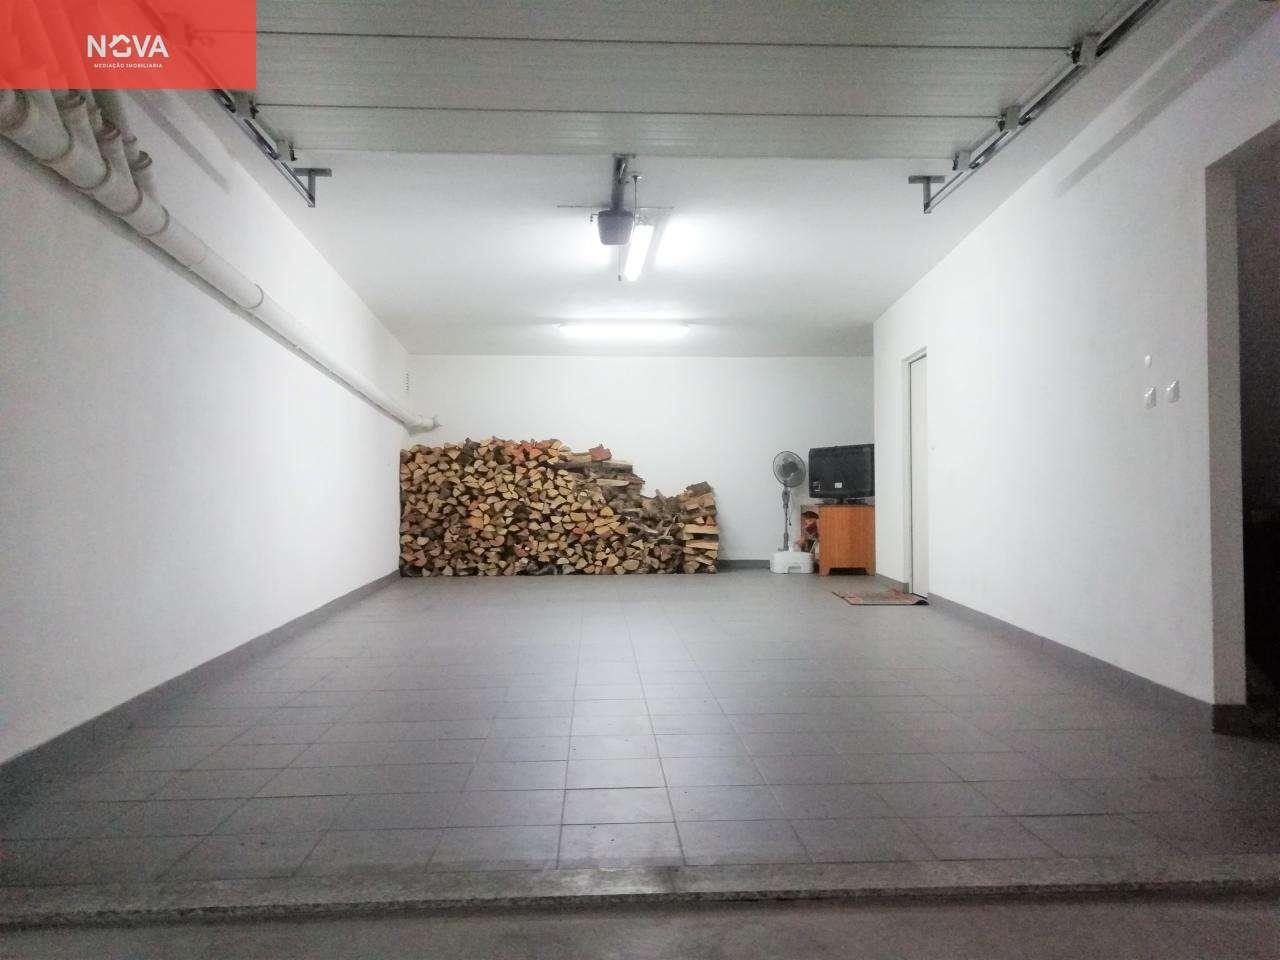 Moradia para comprar, Vila do Conde - Foto 16